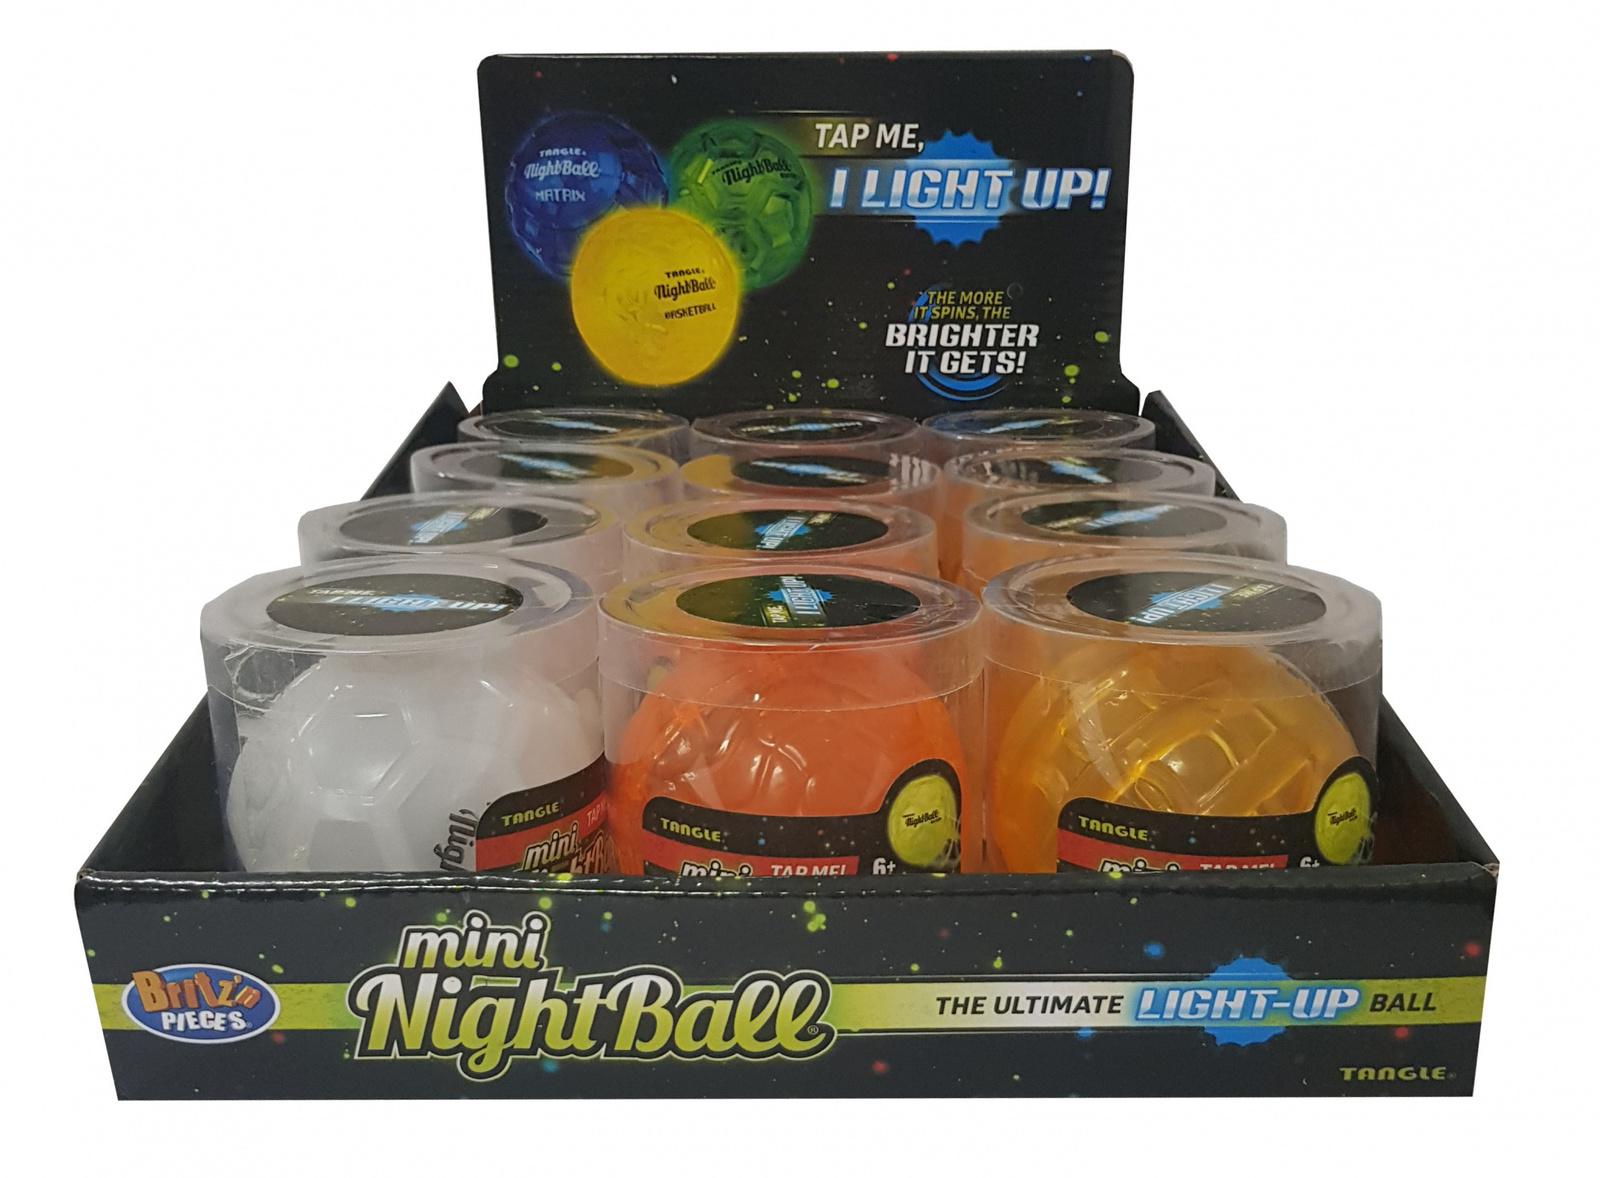 Britz 'n Pieces: Nightball Mini Ball - Soccer image